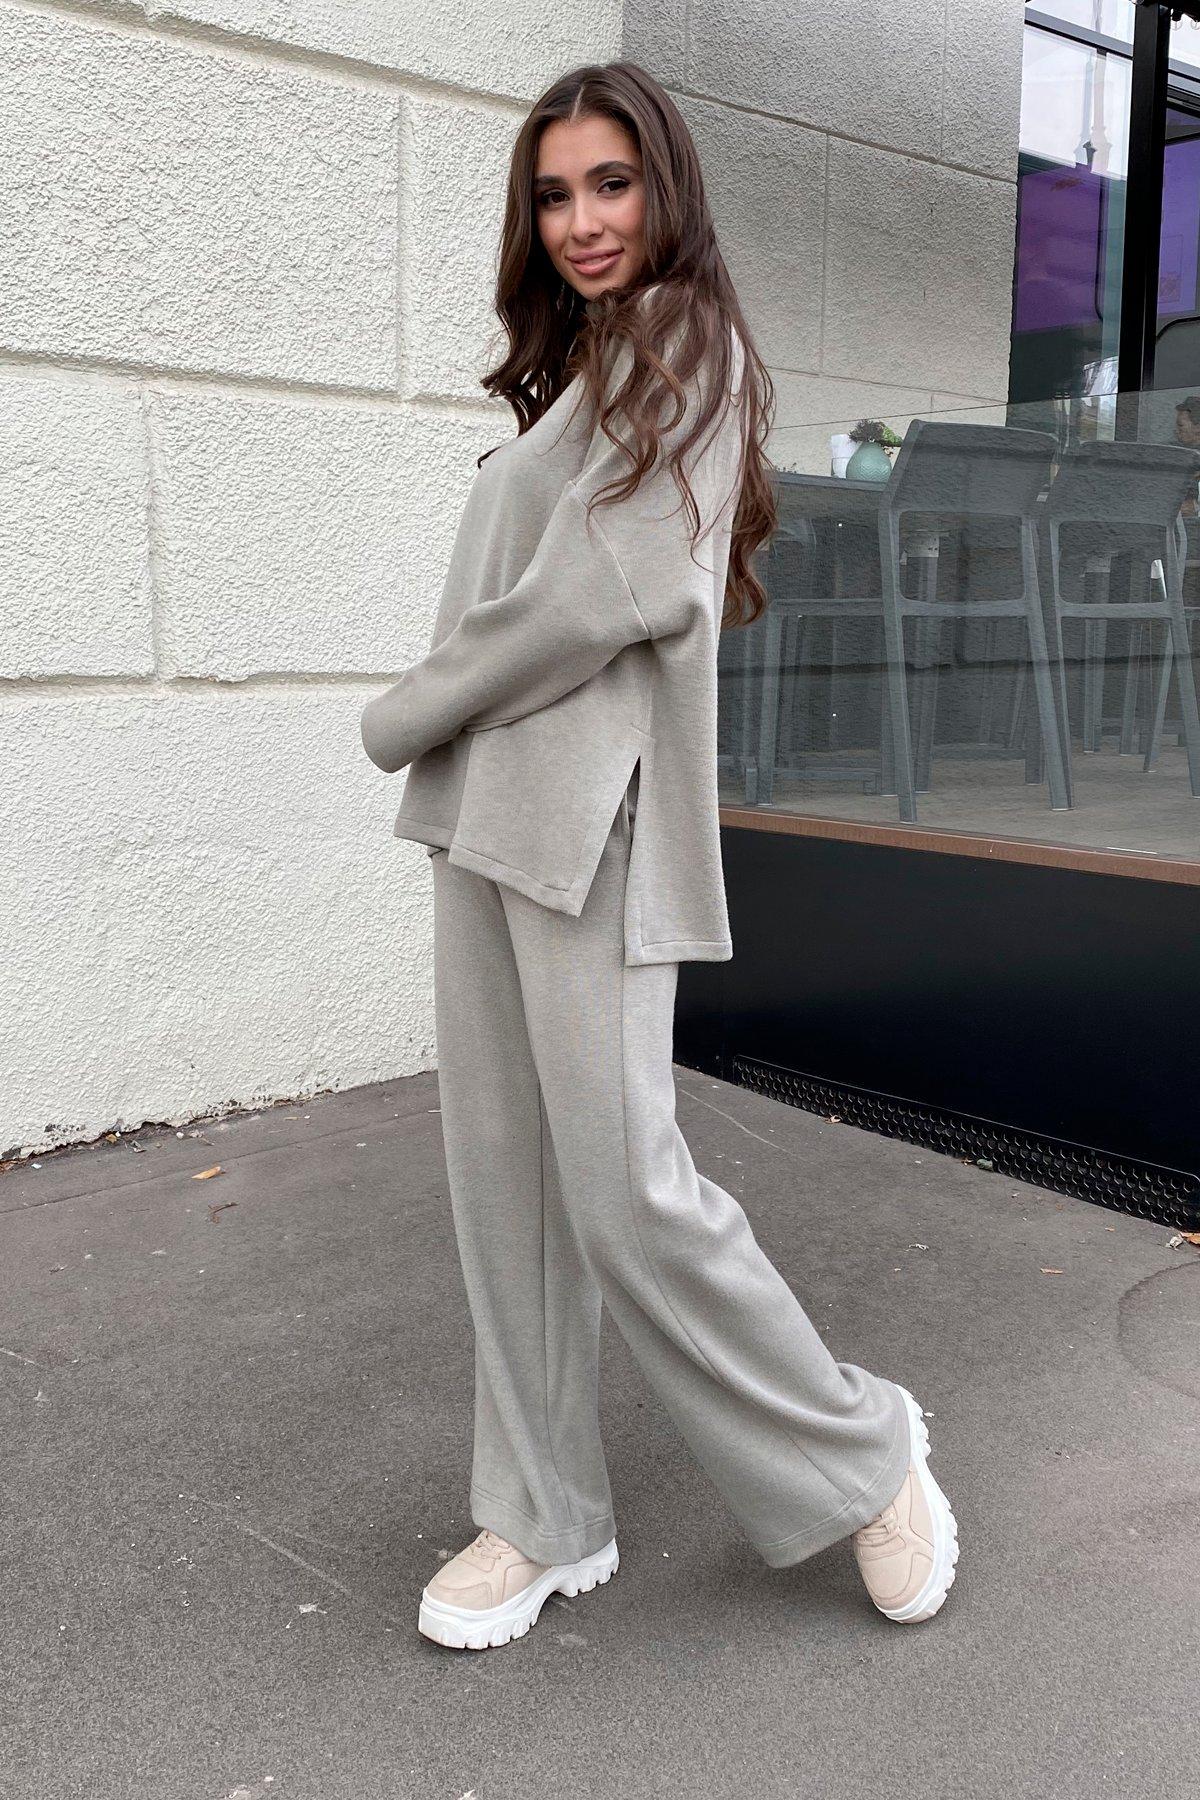 Лав Ю трикотаж ангора прогулочный костюм 9806 АРТ. 46182 Цвет: Олива - фото 7, интернет магазин tm-modus.ru